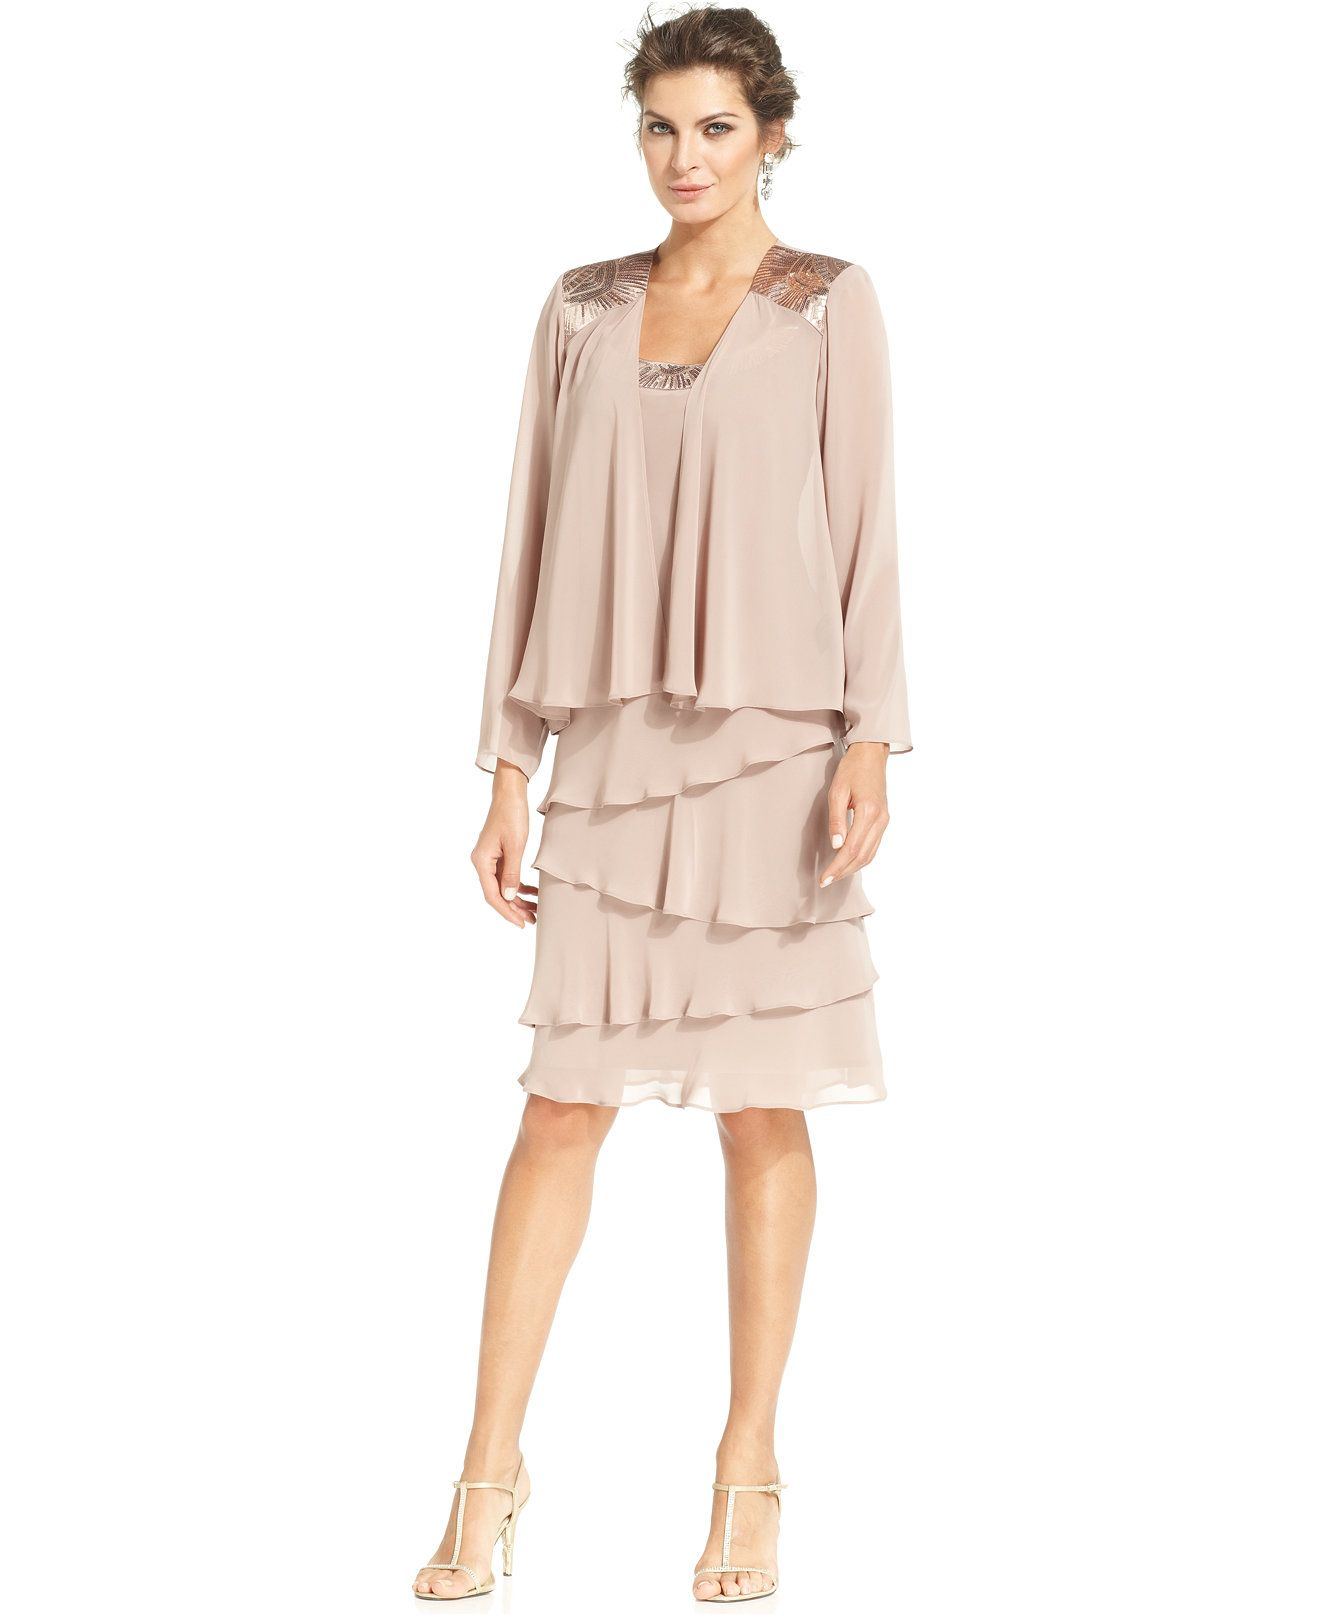 Sl sl fashion dresses - Sl Fashions Sleeveless Embellished Tiered Dress Shrug Macys Com Wedding Pinterest Tiered Dress Mob Dresses And Fashion